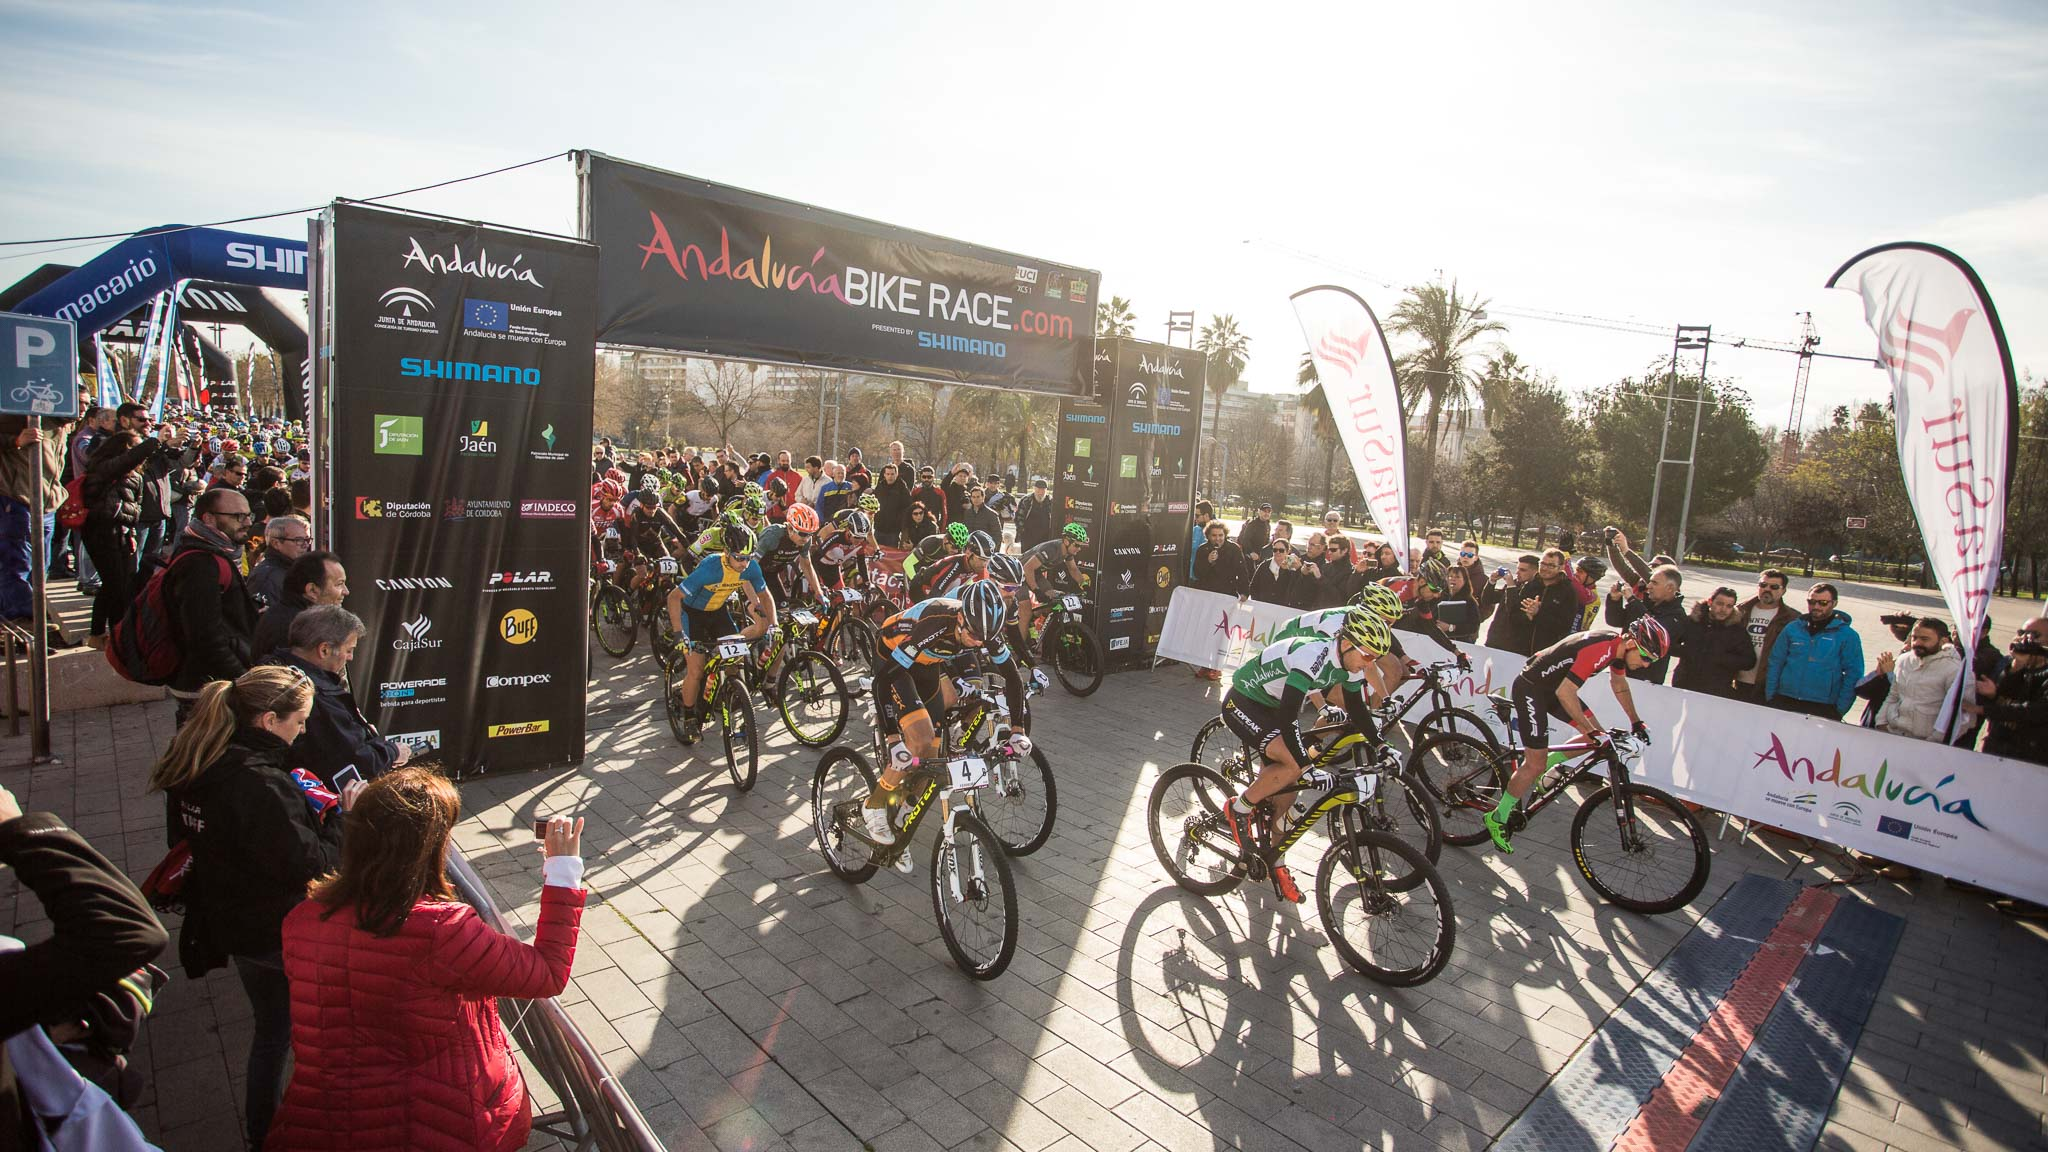 20160226-Andalucia-Bike-Race-2016-B29B1943